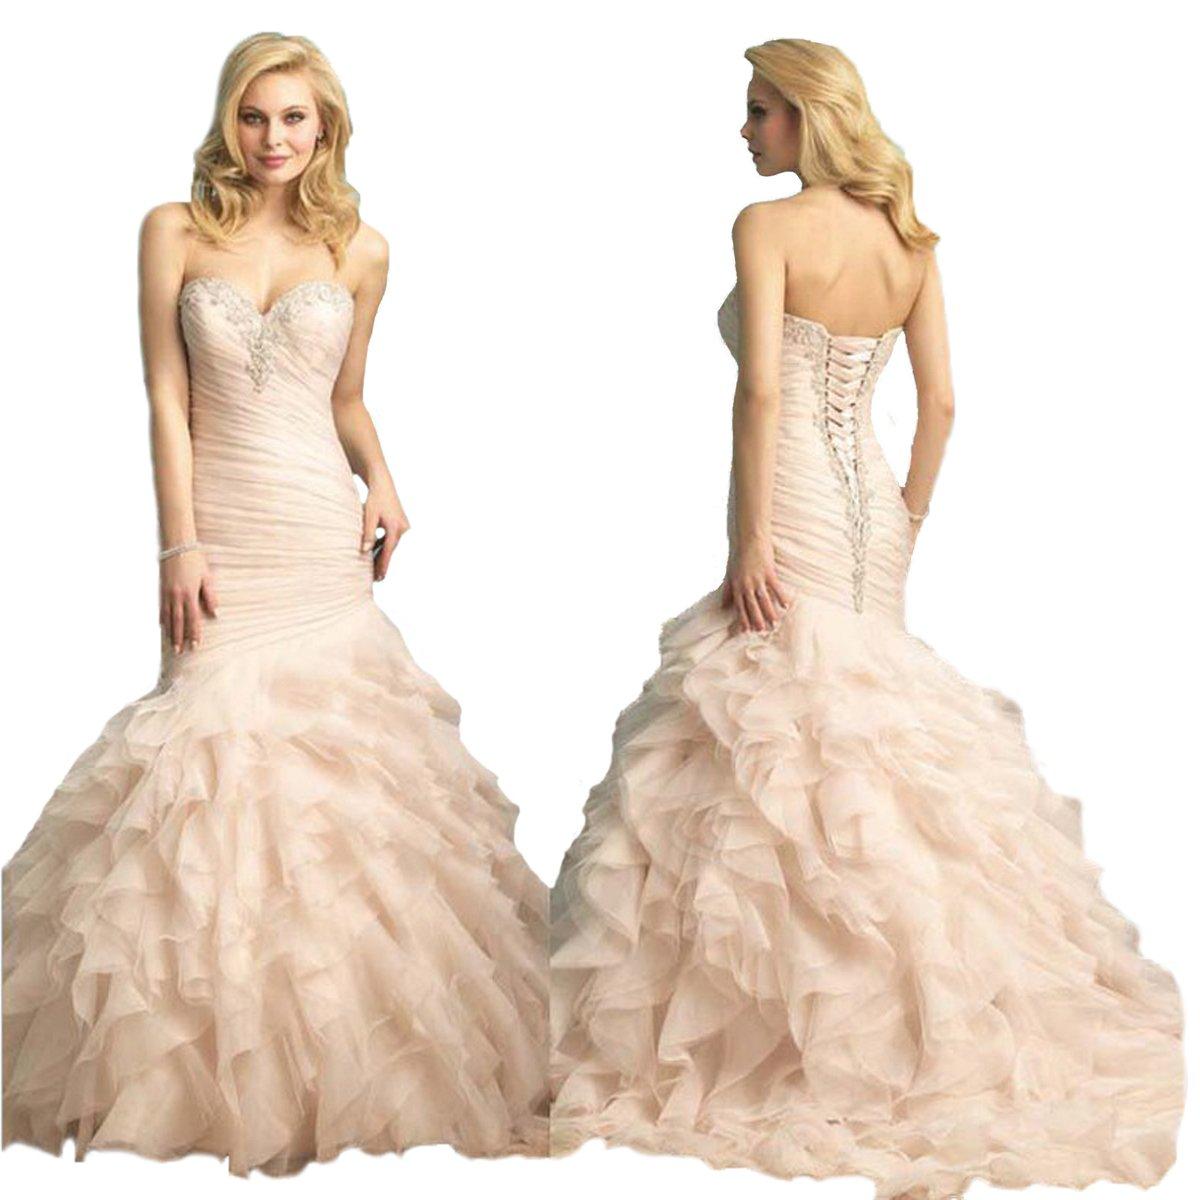 Angel Formal Dresses Women's Sweetheart Applique Beaded Mermaid Ruffles Tulle Wedding Dresses Gown(18,Ivory) by Angel Formal Dresses (Image #1)